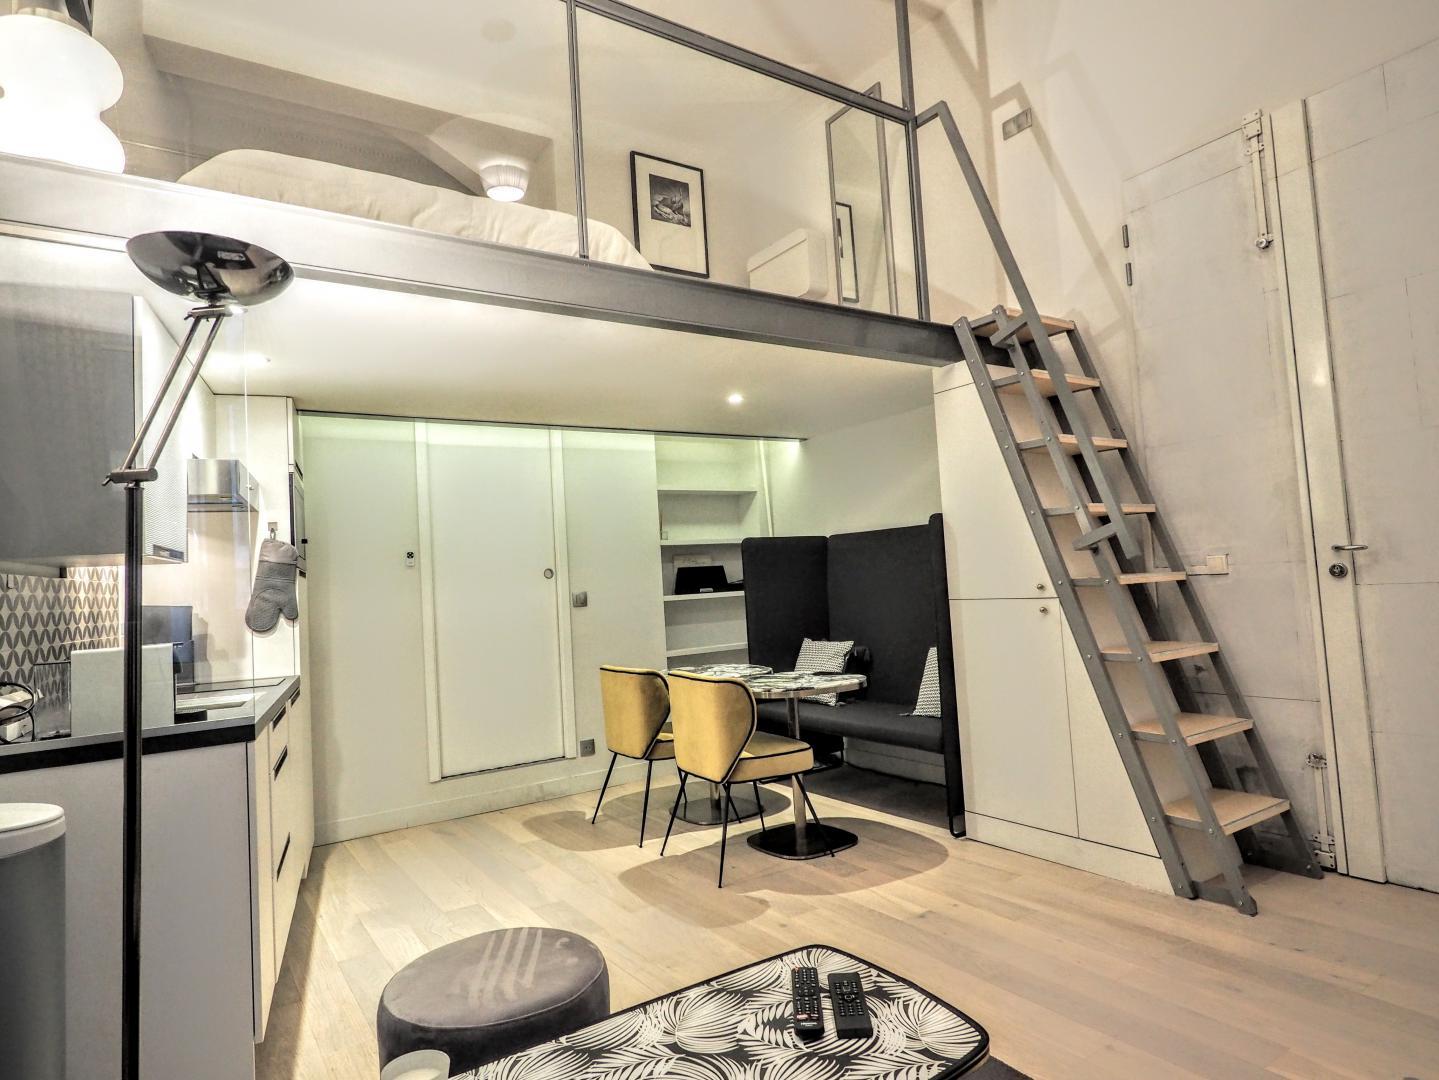 location appartement meubl paris grand studio louer invalides. Black Bedroom Furniture Sets. Home Design Ideas